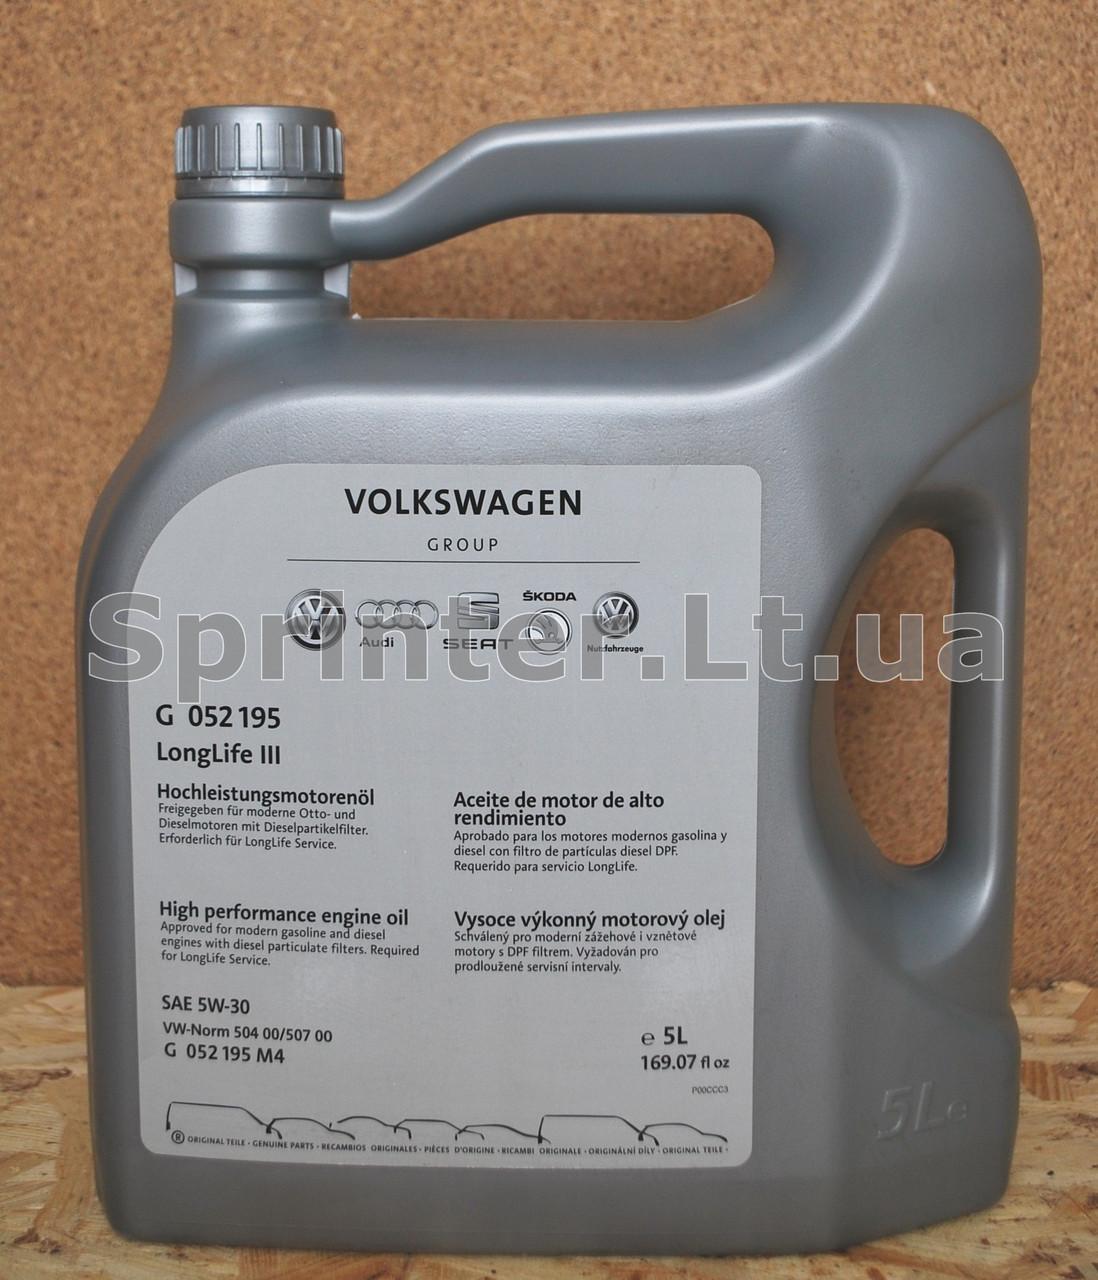 Моторное масло VW Longlife III 5W-30, 5л VW504.00/507.00